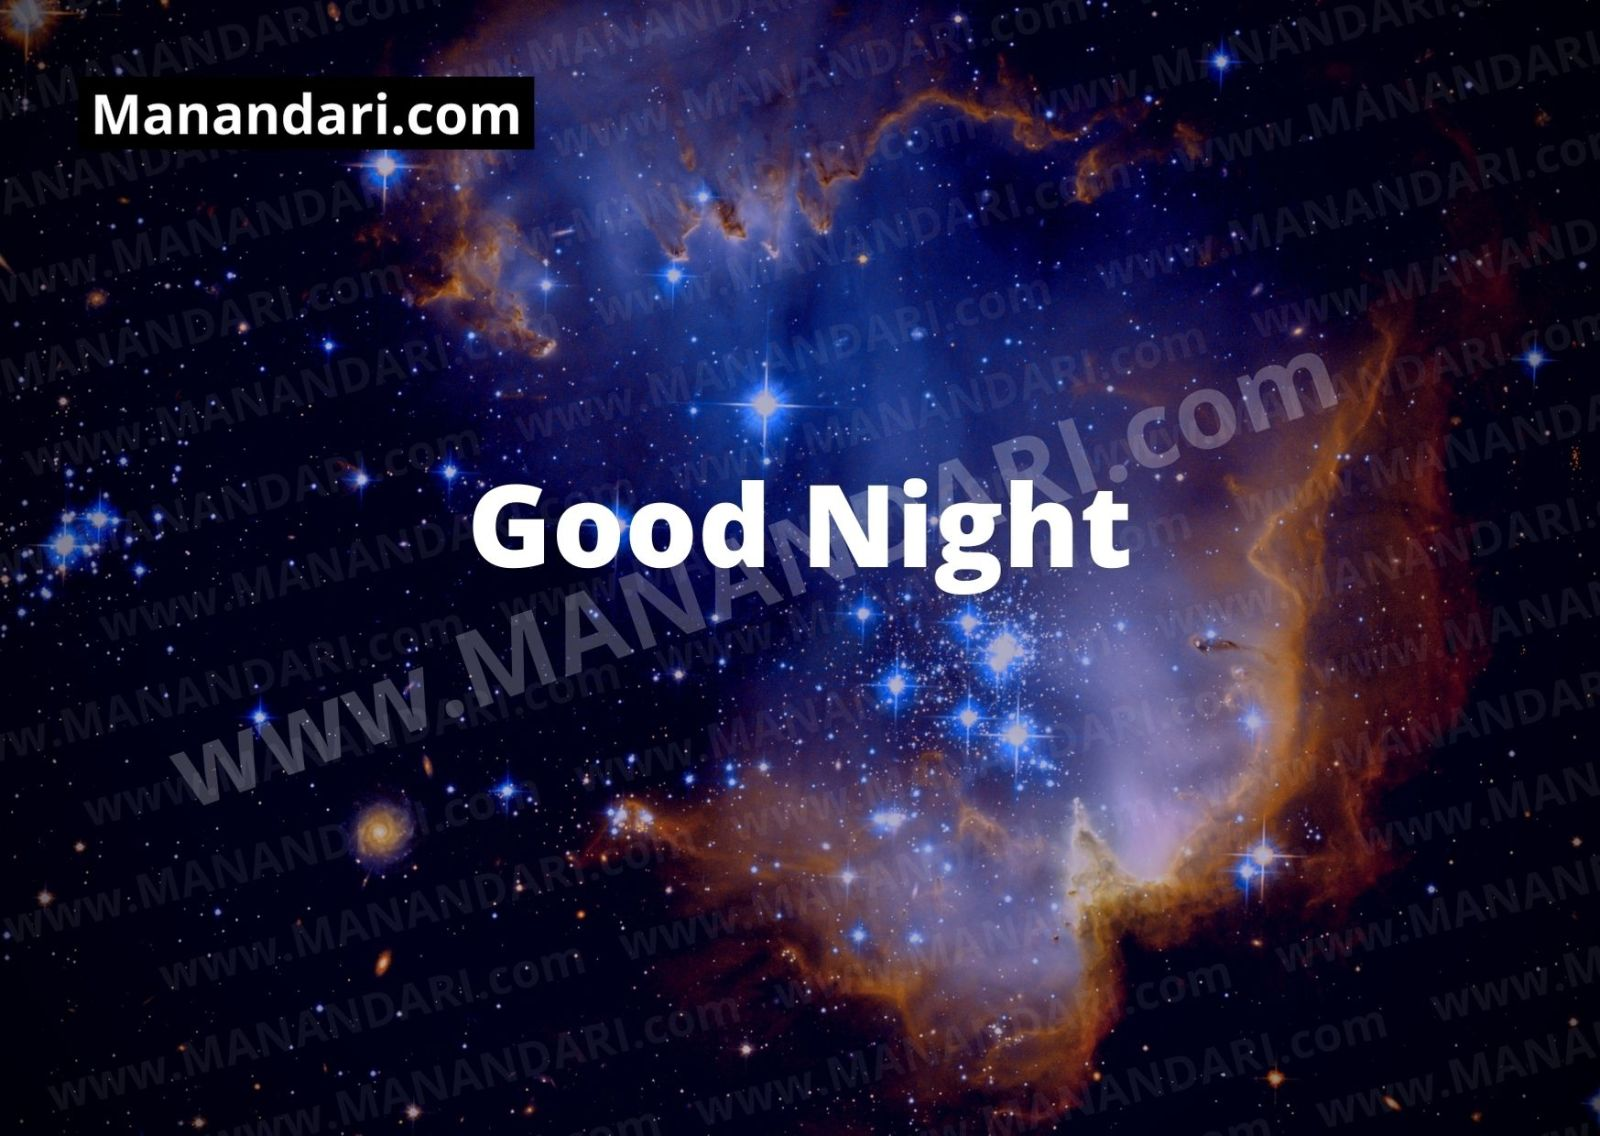 Good Night - 15